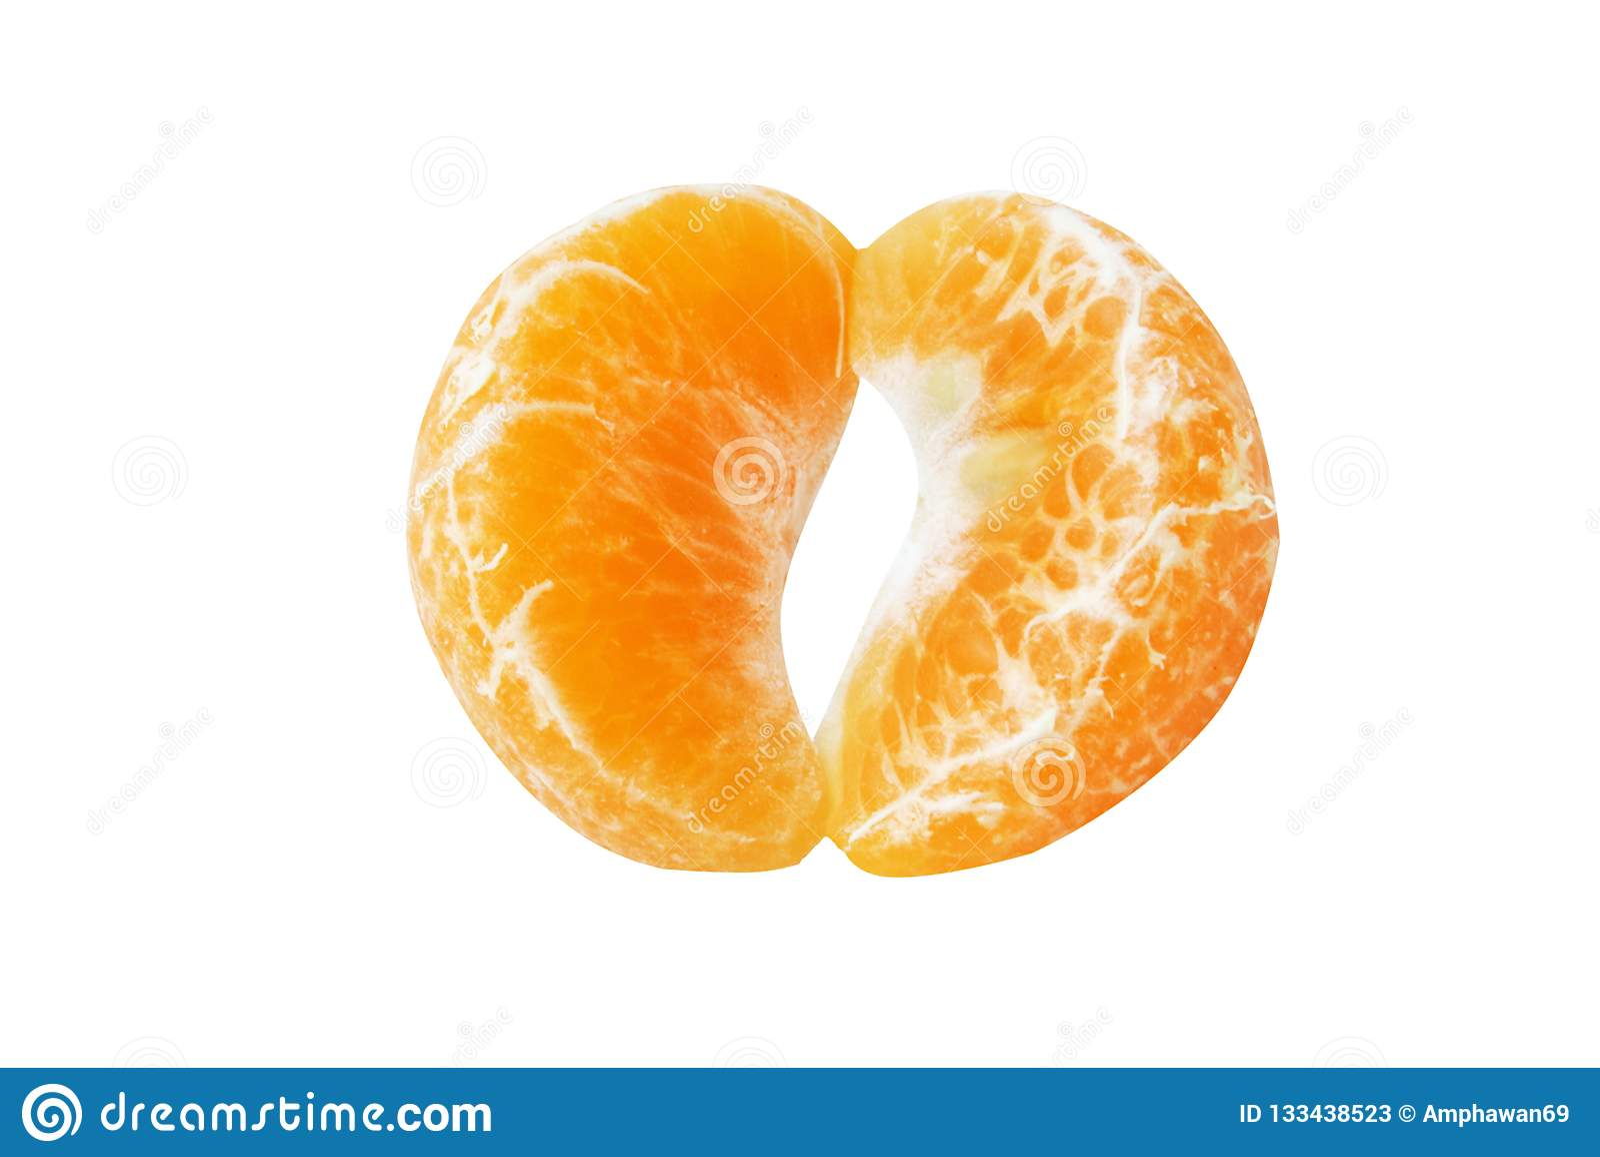 Rebanada de mandarina